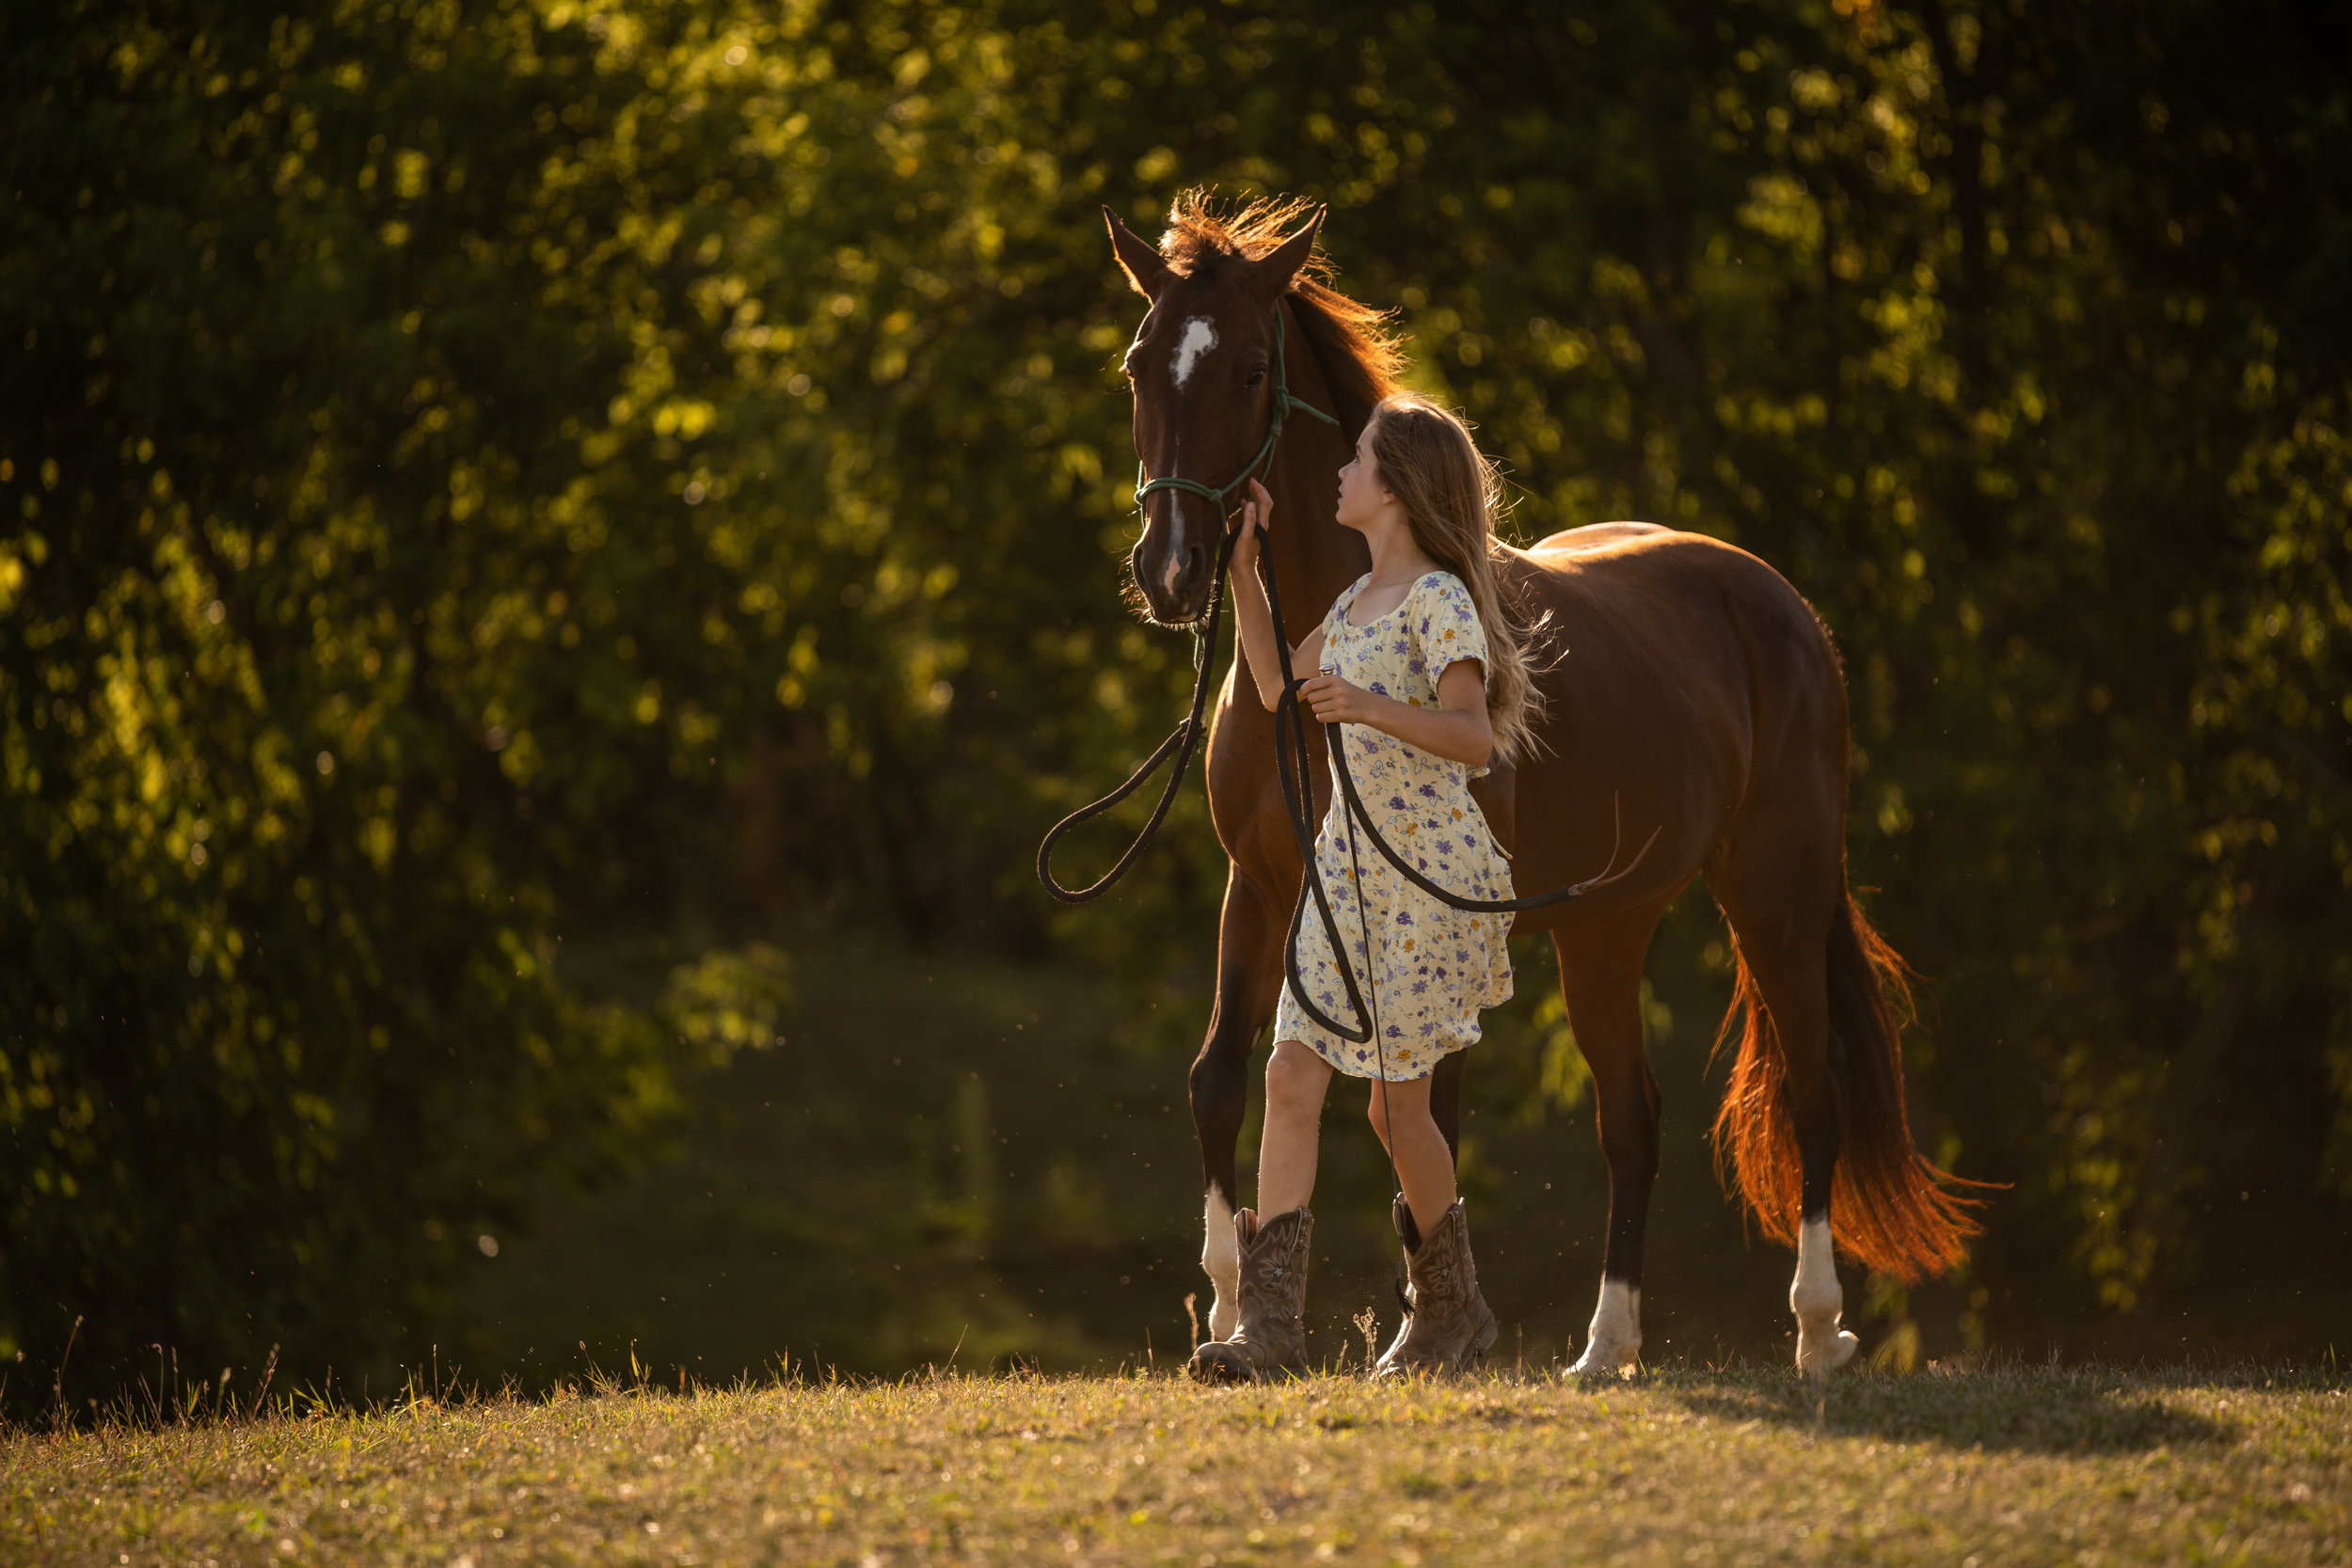 Jemma Sunset Shoot-12.jpg